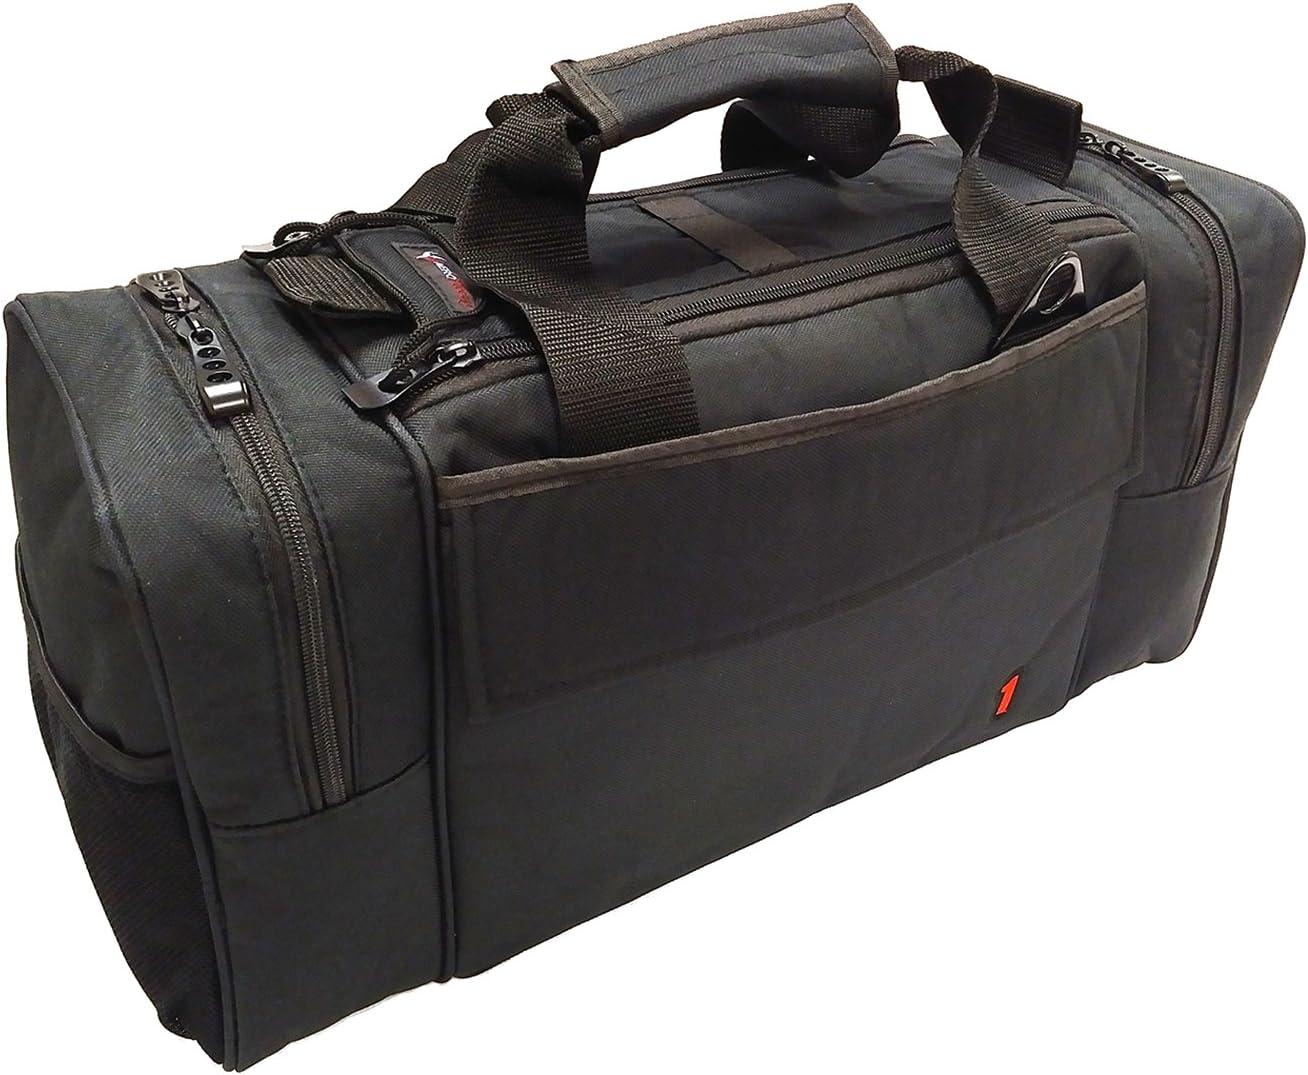 Aero Phoenix Bolsa de Vuelo 1 V2 – Bolsa de Cabina: Amazon.es: Electrónica